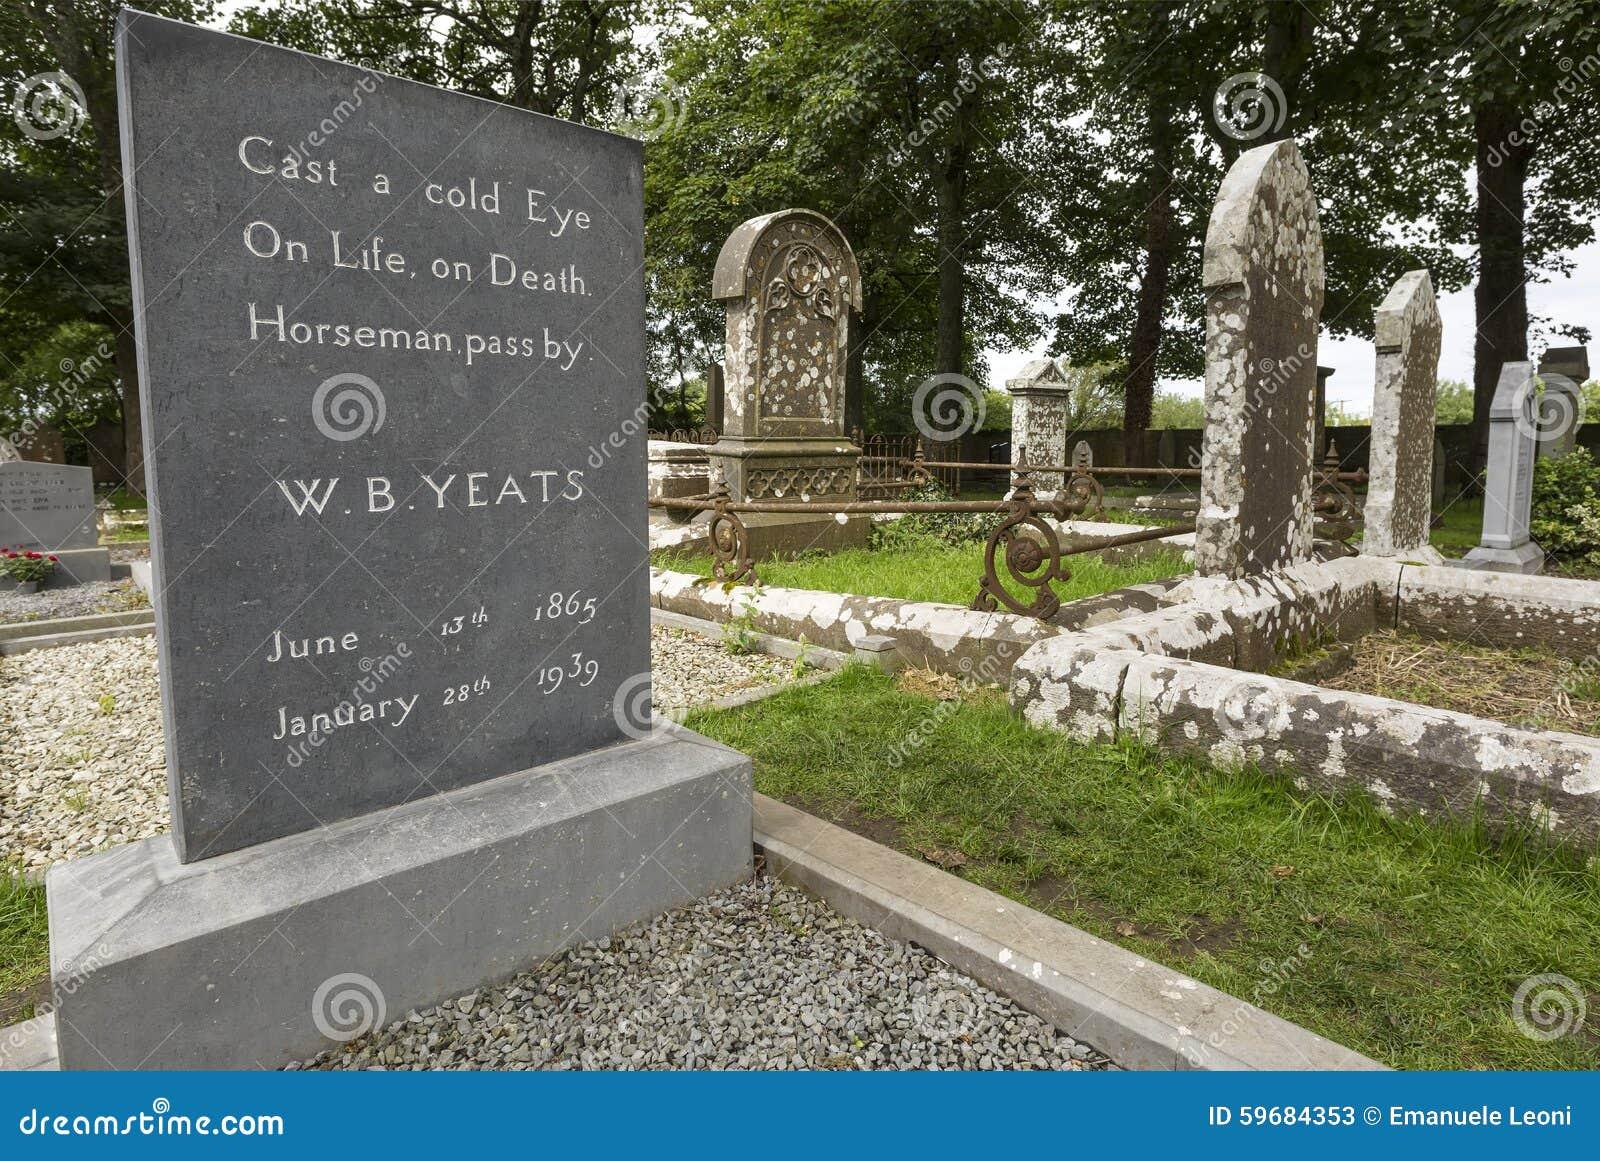 William Butler Yeats grave in Drumcliff, County Sligo, Ireland.